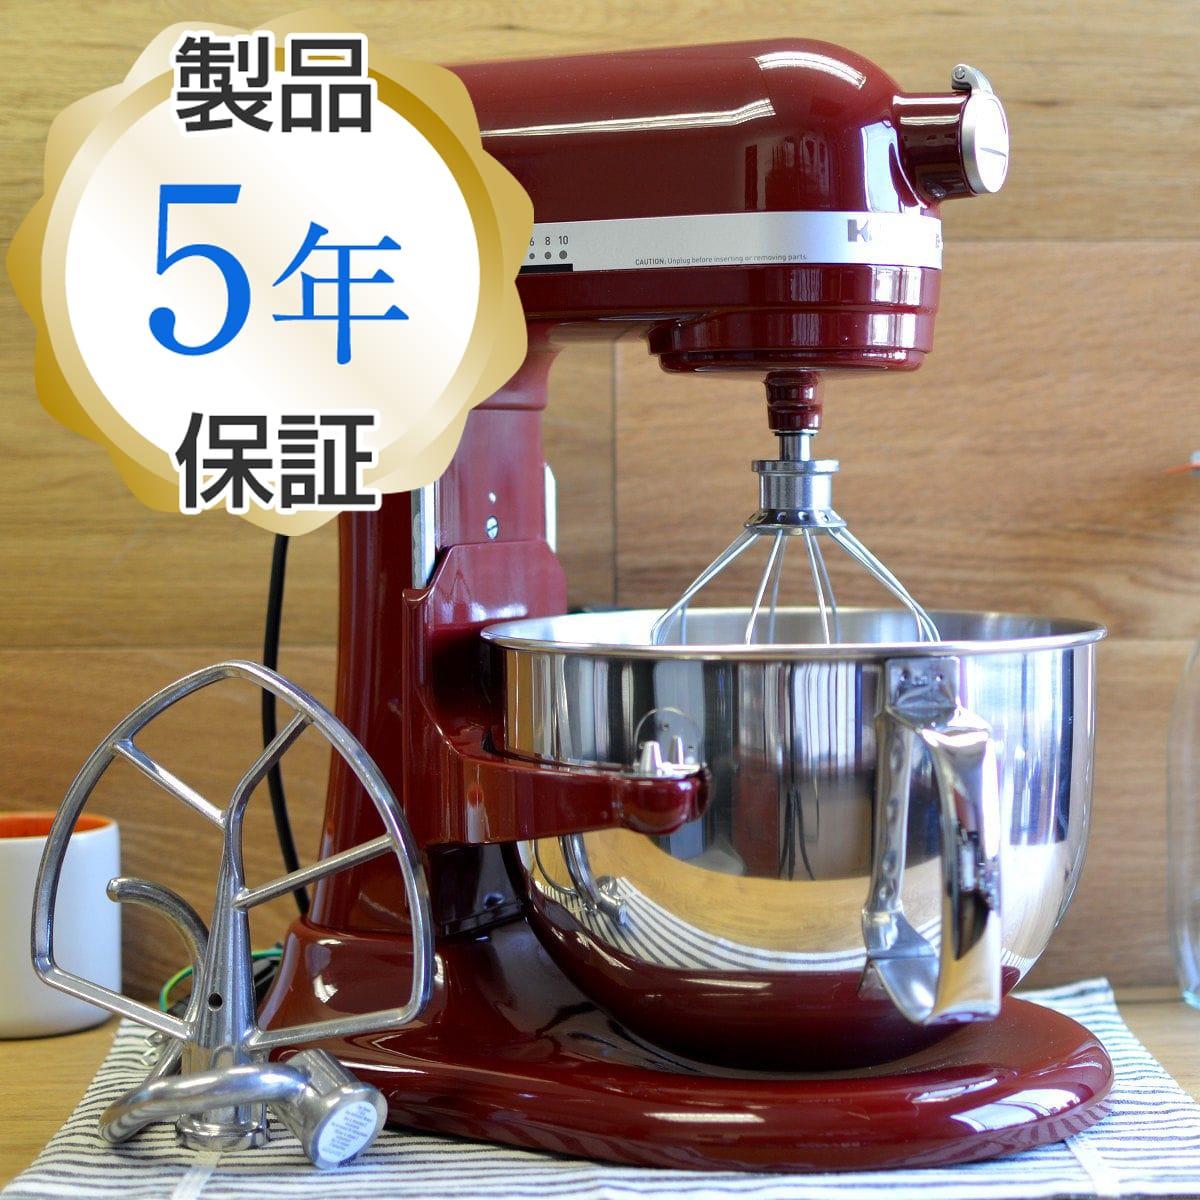 Alphaespace Usa Kitchen Aid Stands Mixer Professional 600